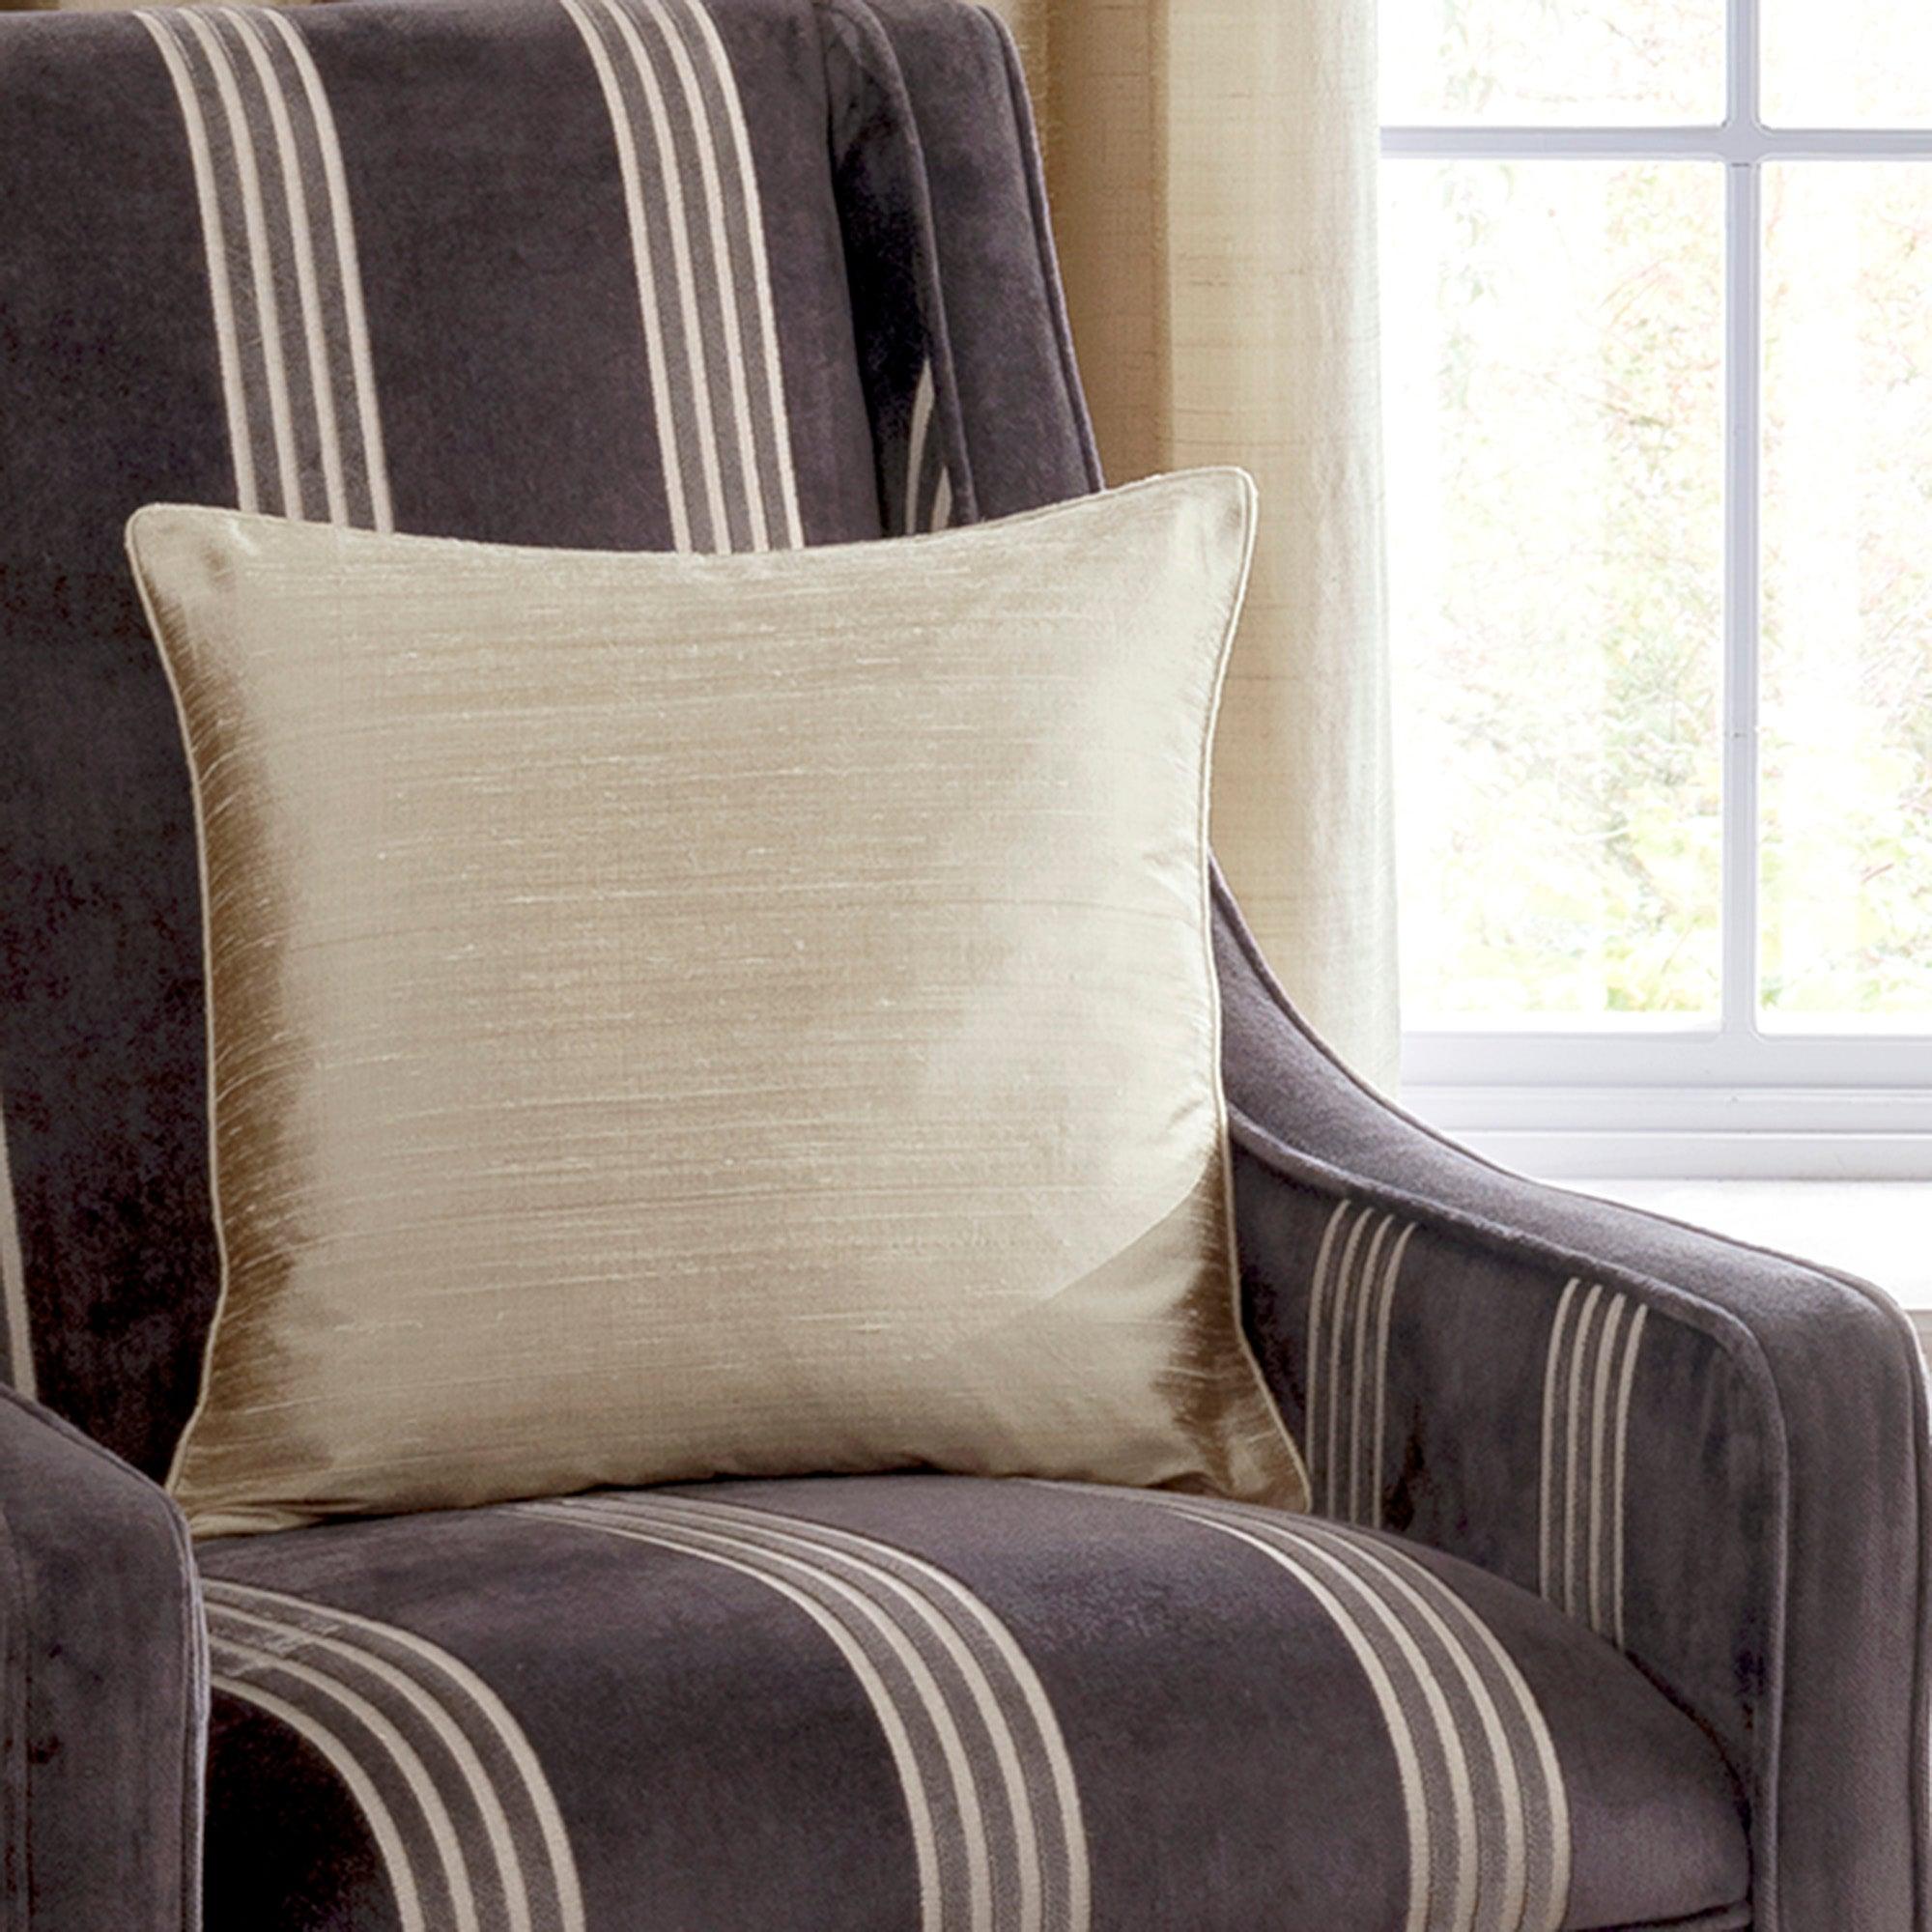 Dorma Champagne Beresford Collection Cushion